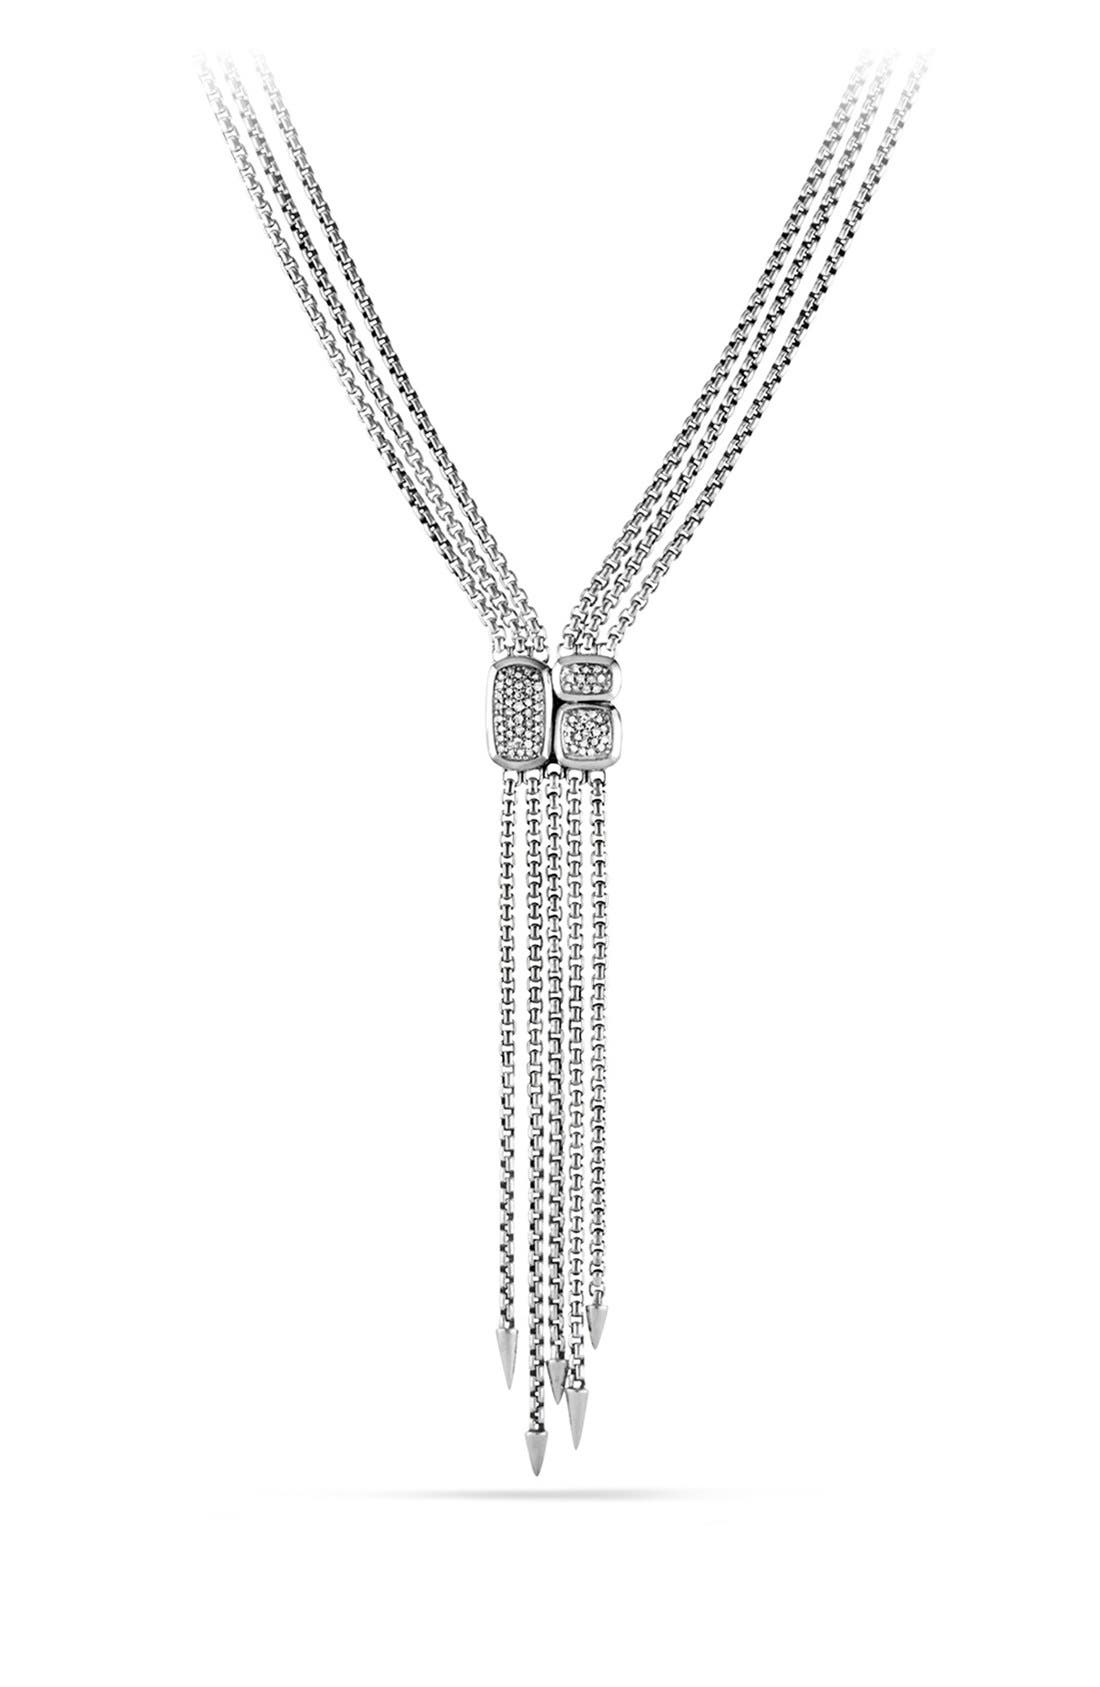 DAVID YURMAN 'Confetti' Drop Necklace with Diamonds